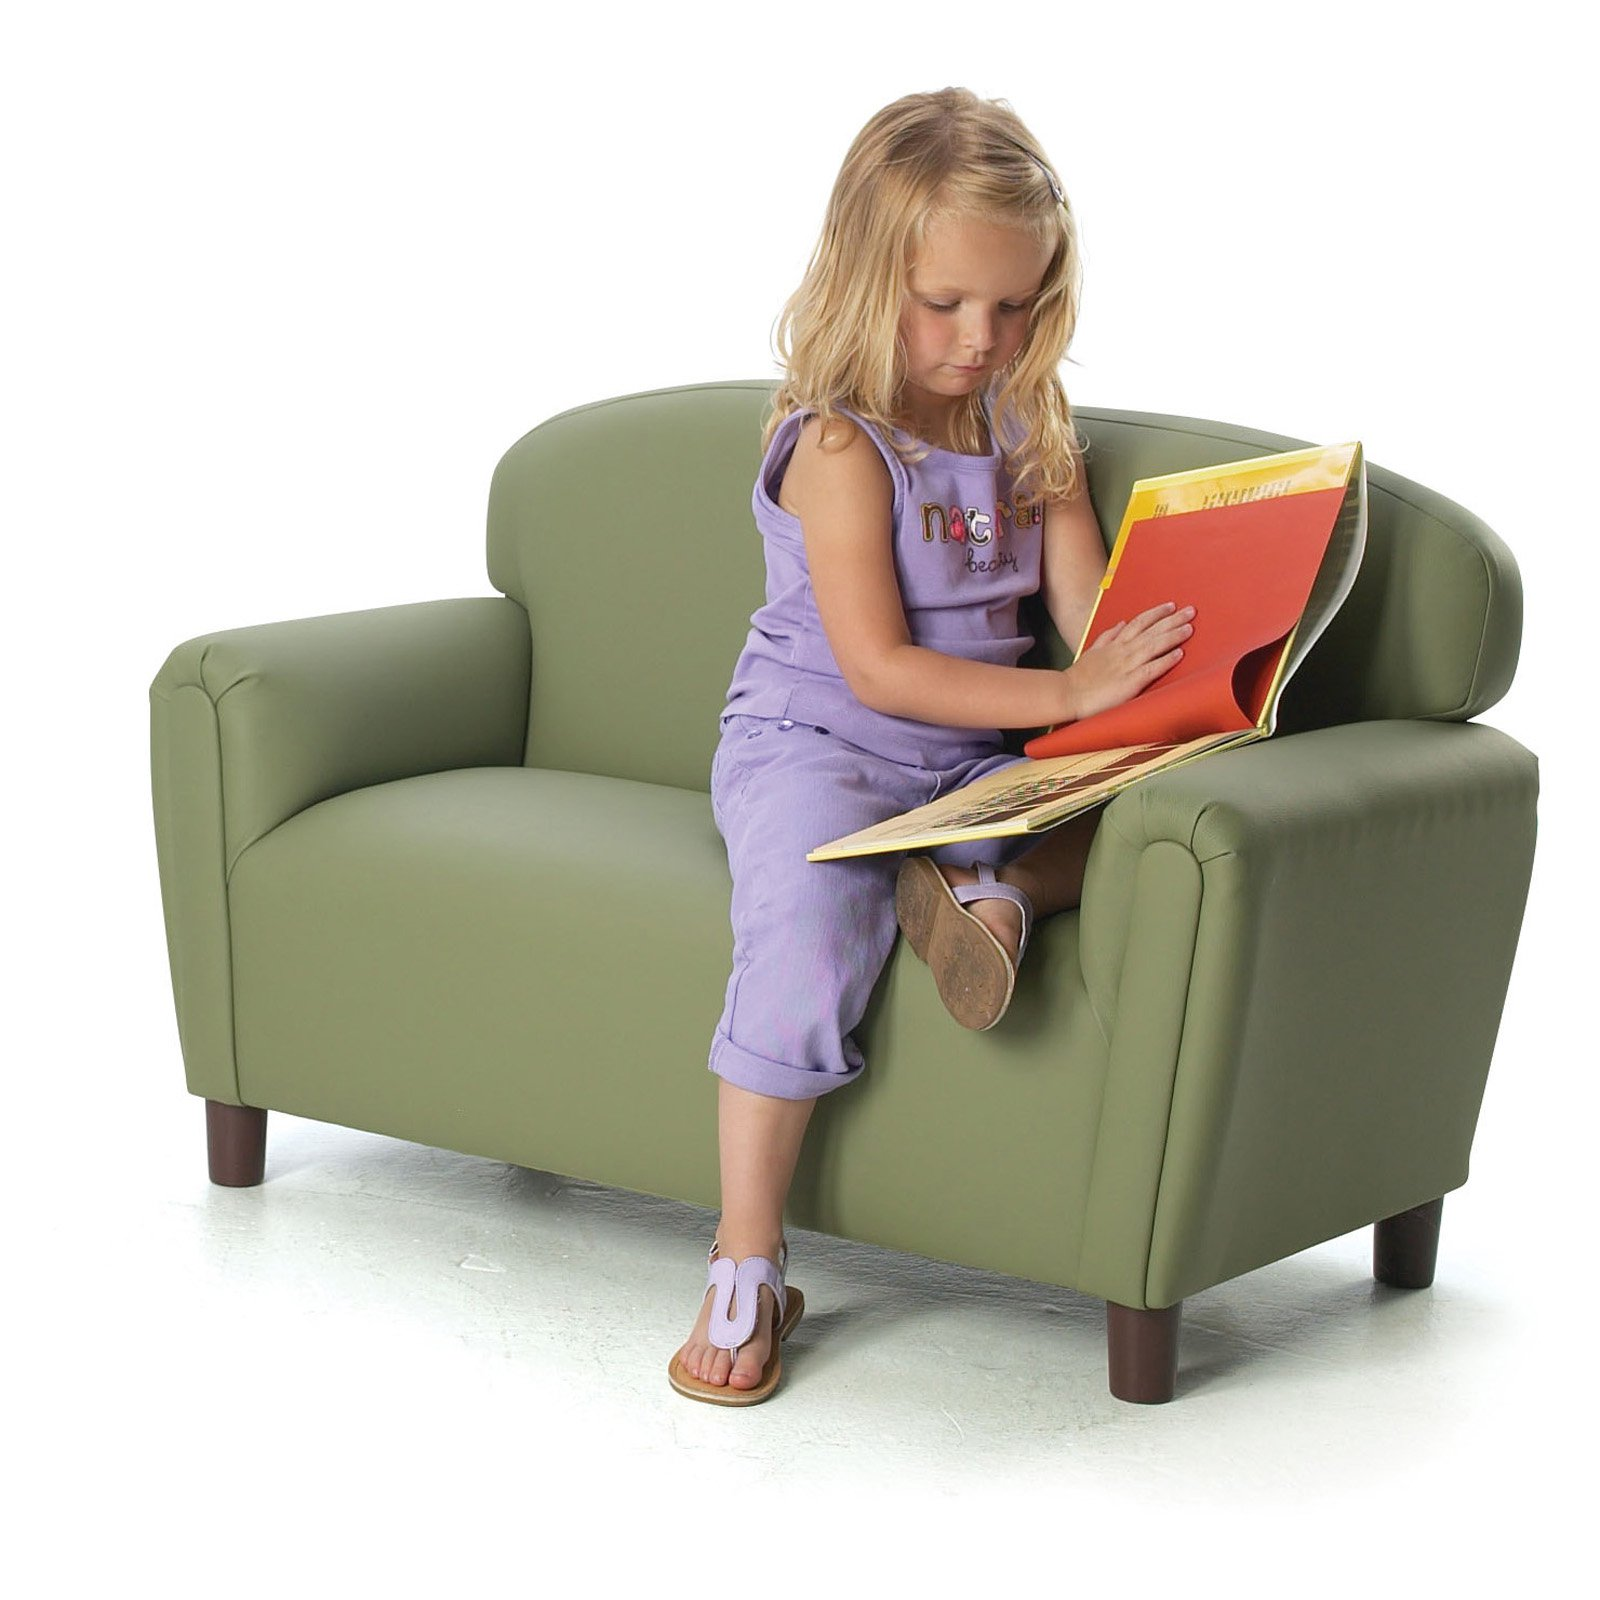 Brand New World Enviro-Child Upholstered Preschool Sofa by Brand New World